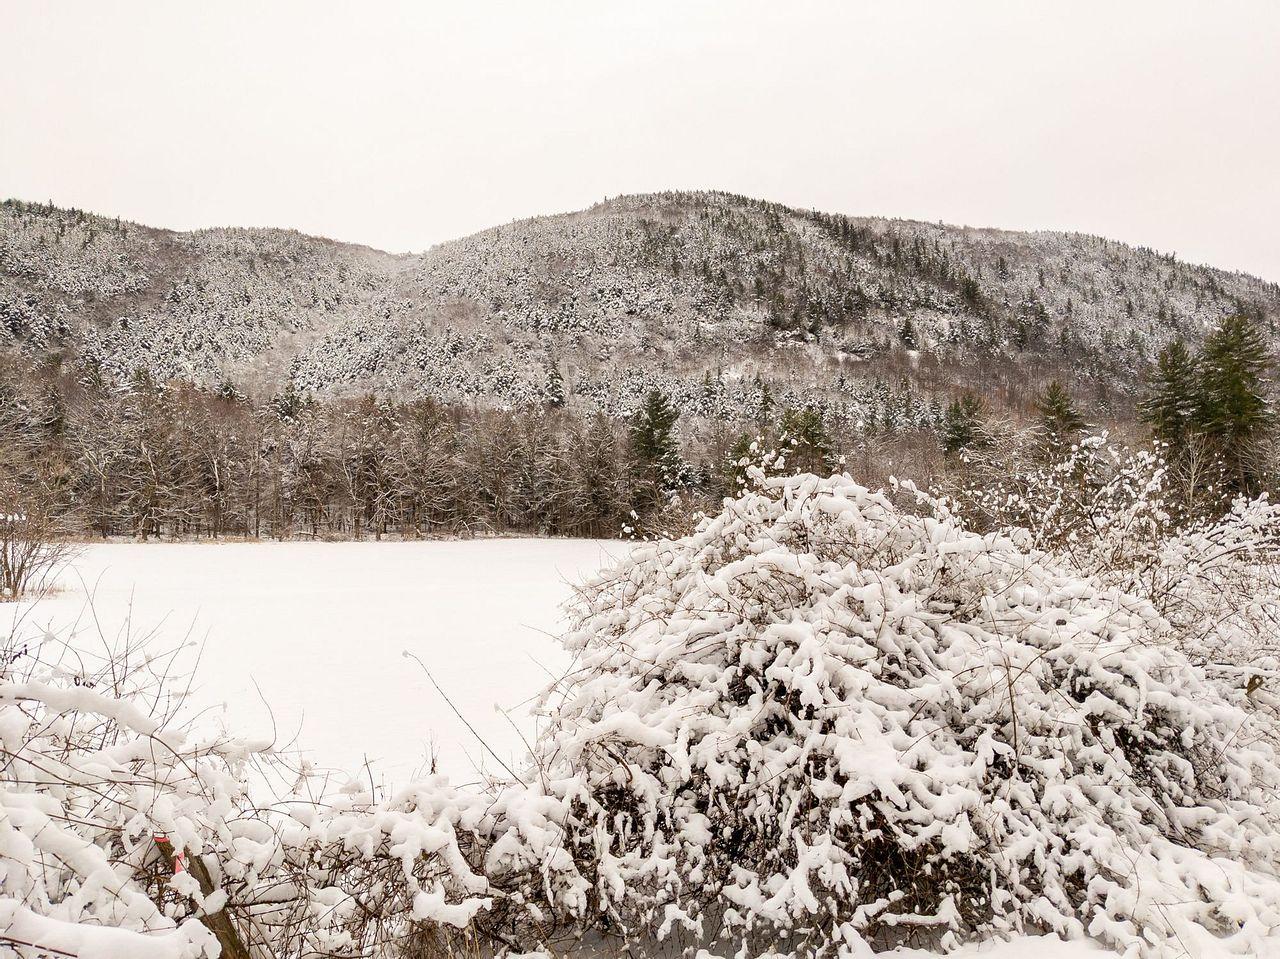 Winter RVing - January Update